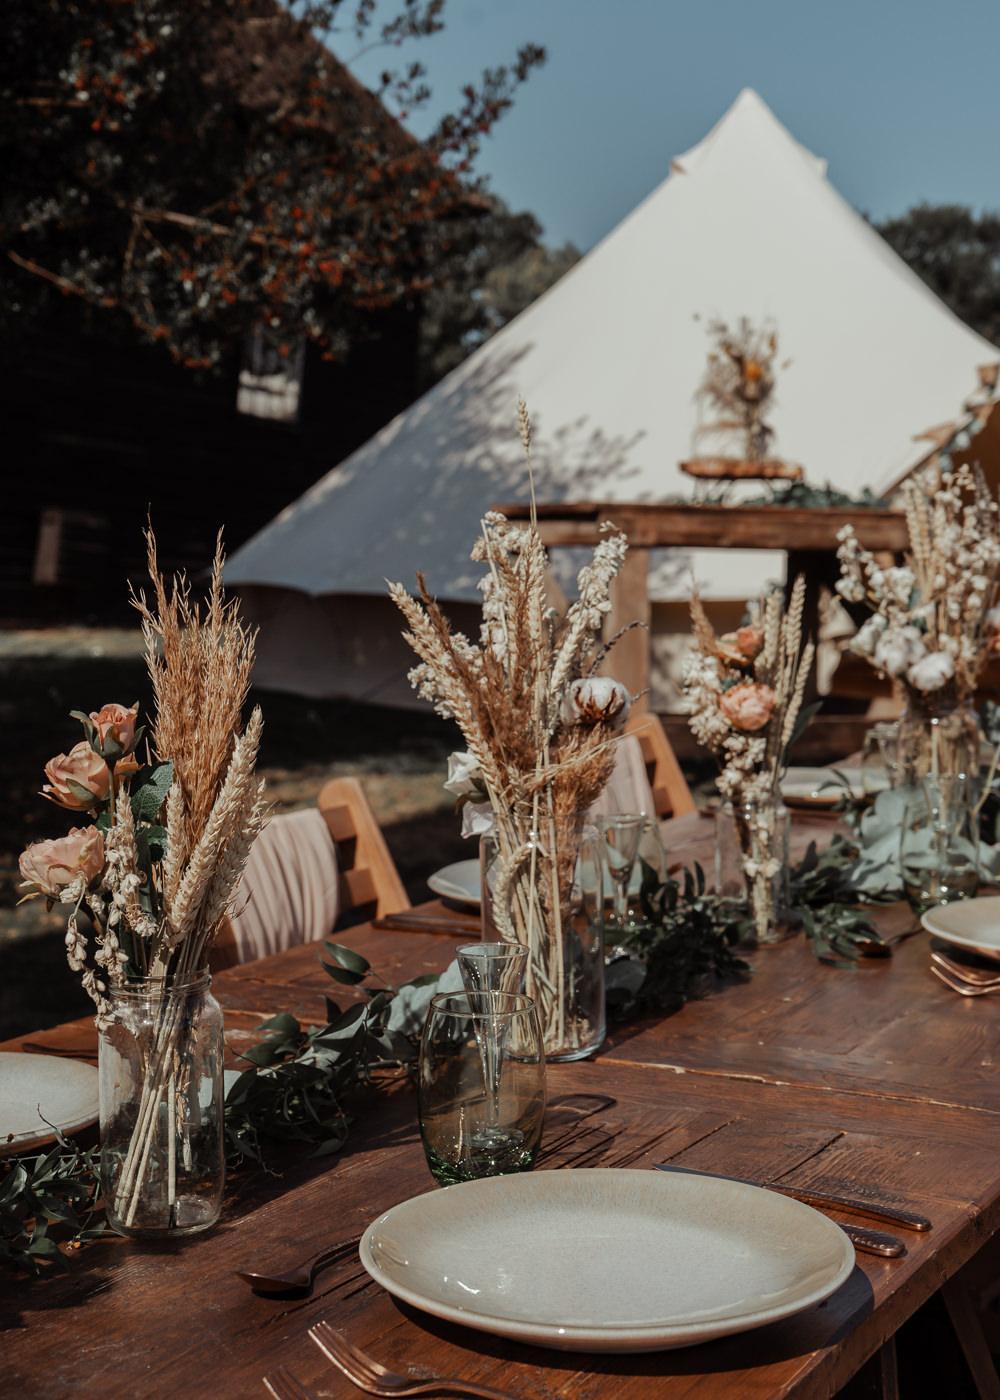 Centrepiece Flowers Dried Flowers Grass Rose Decor Intimate Wedding Ideas Imogen Eve Photography